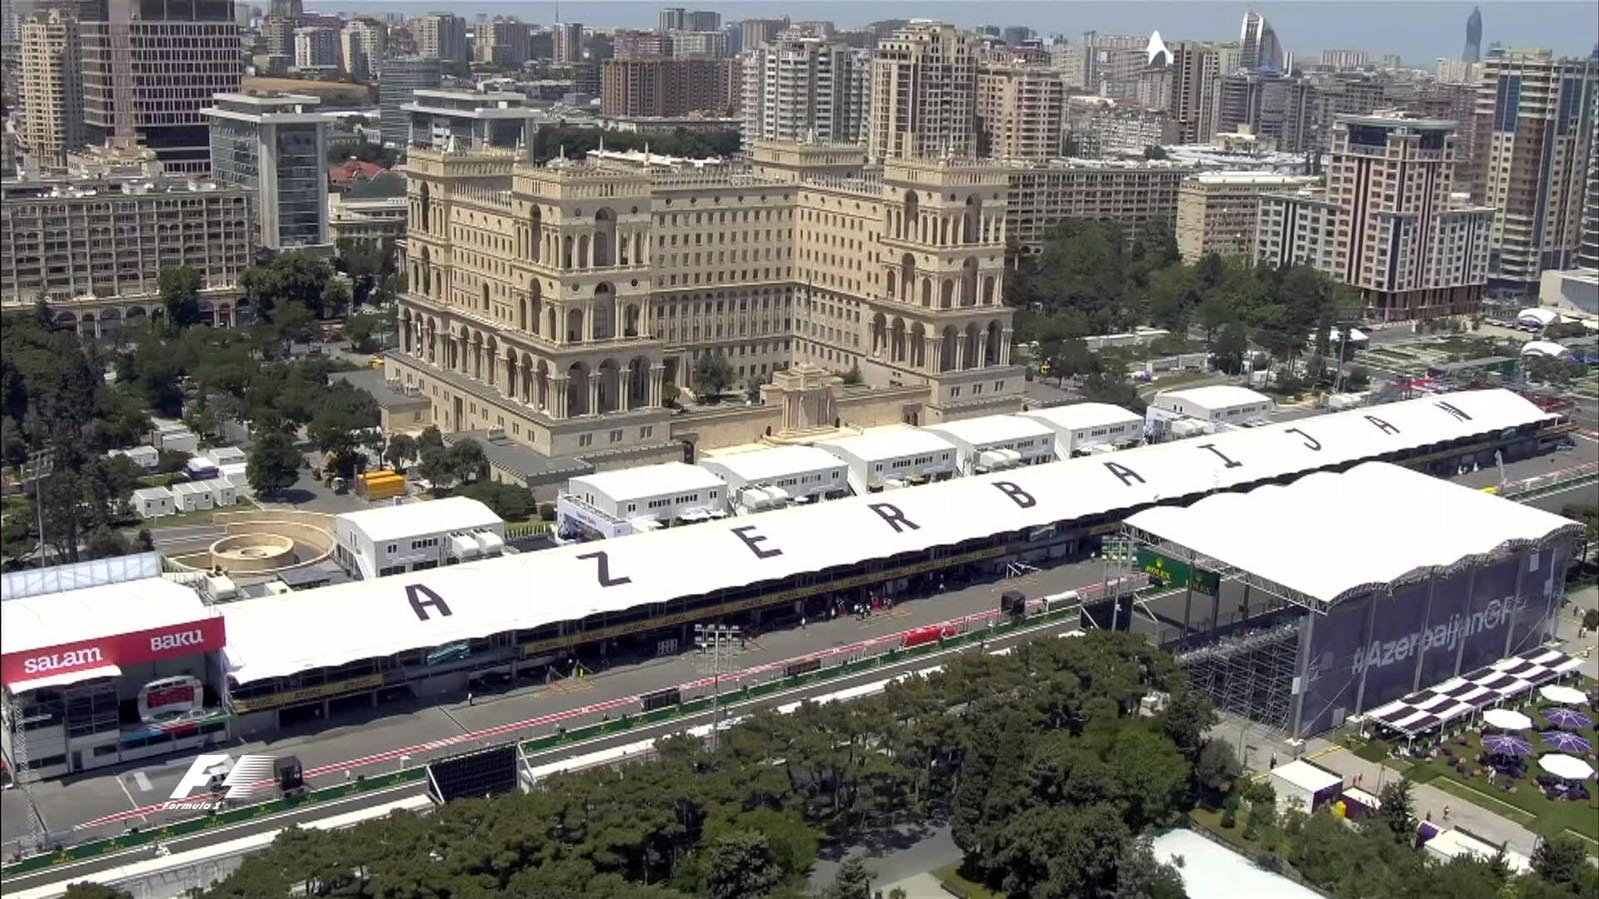 Photo of GP Αζερμπαϊτζάν: Στην pole position o Hamilton (Mercedes) για 66η φορά στην καριέρα του, ακολουθούν οι Bottas (Mercedes), Raikkonen (Ferrari), Vettel (Ferrari), Verstappen (Red Bull)  – Αύριο ο αγώνας ζωντανά στις 16:00 από την ΕΡΤ2.